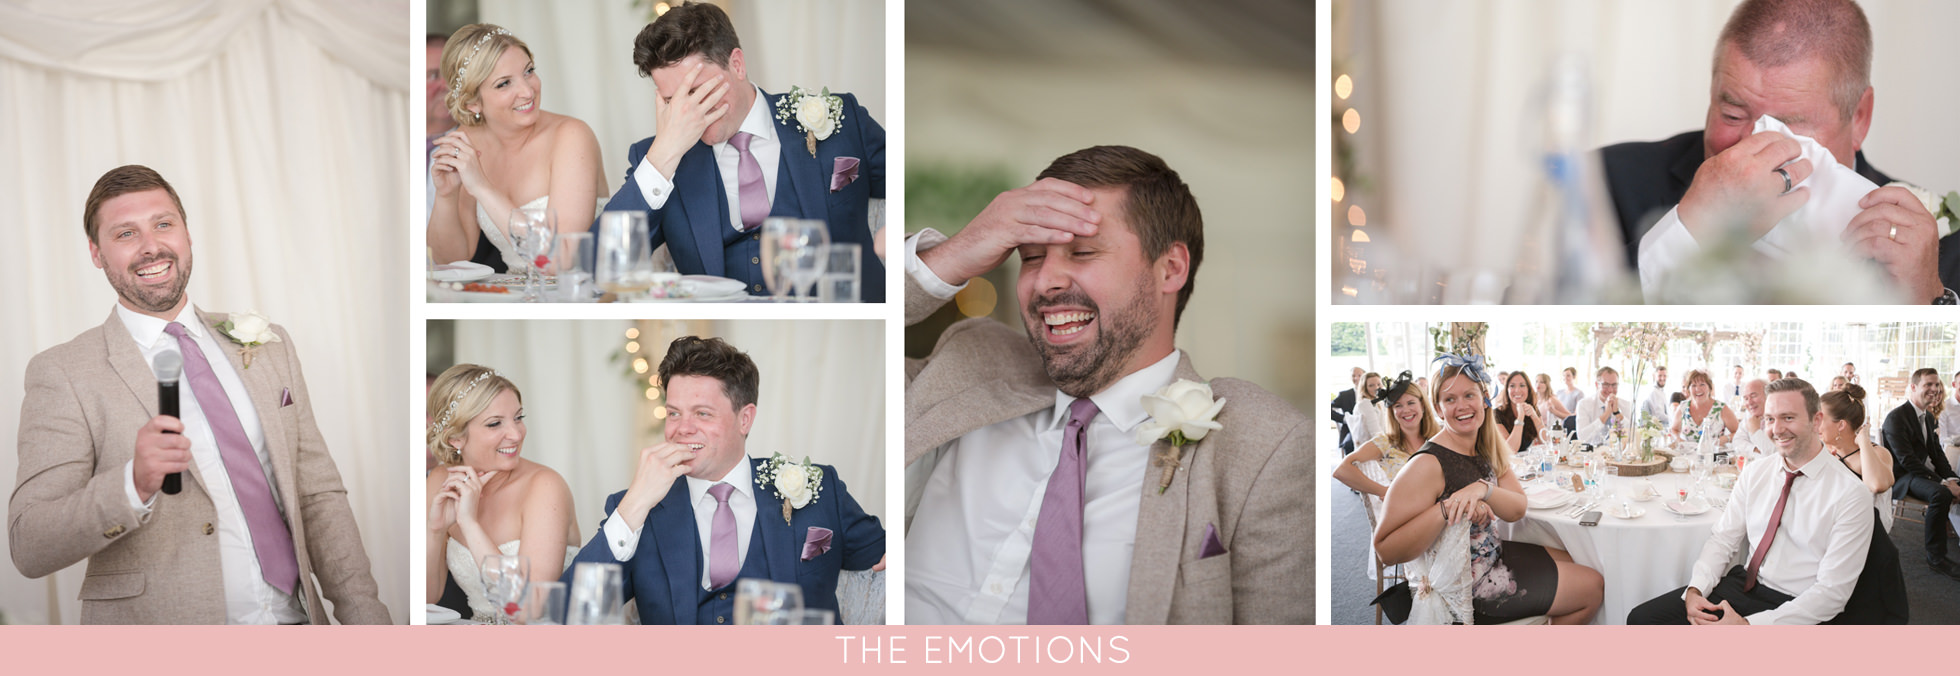 emotional wedding at sultan manor